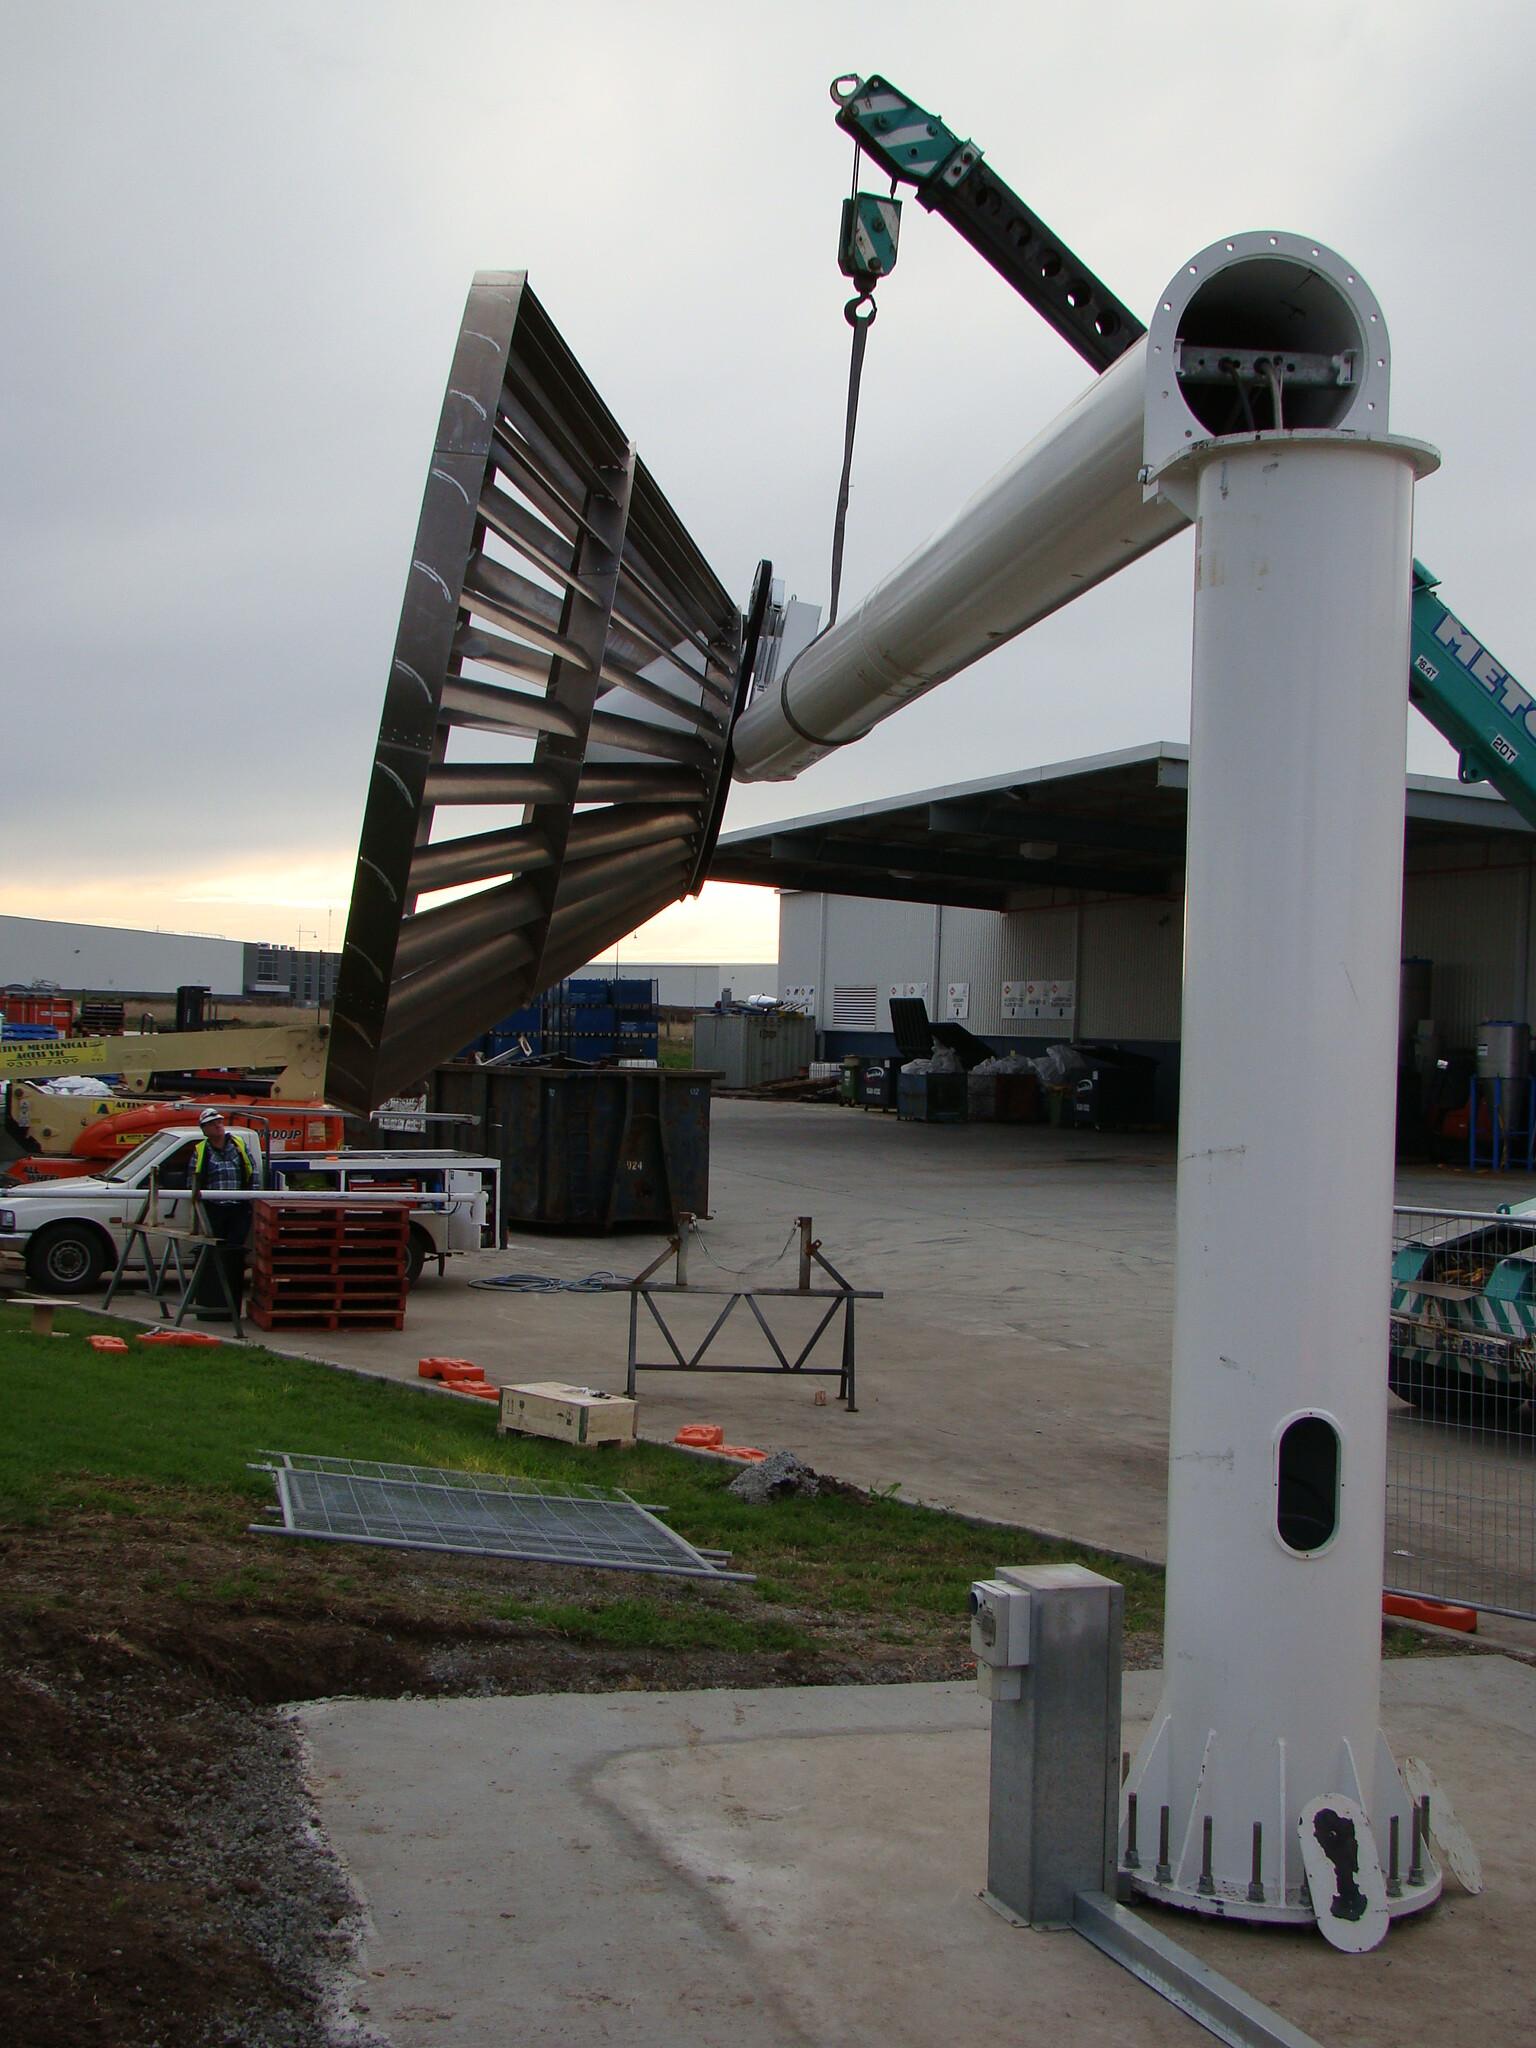 Eco Whisper Turbine: Australian-made, small-scale wind power